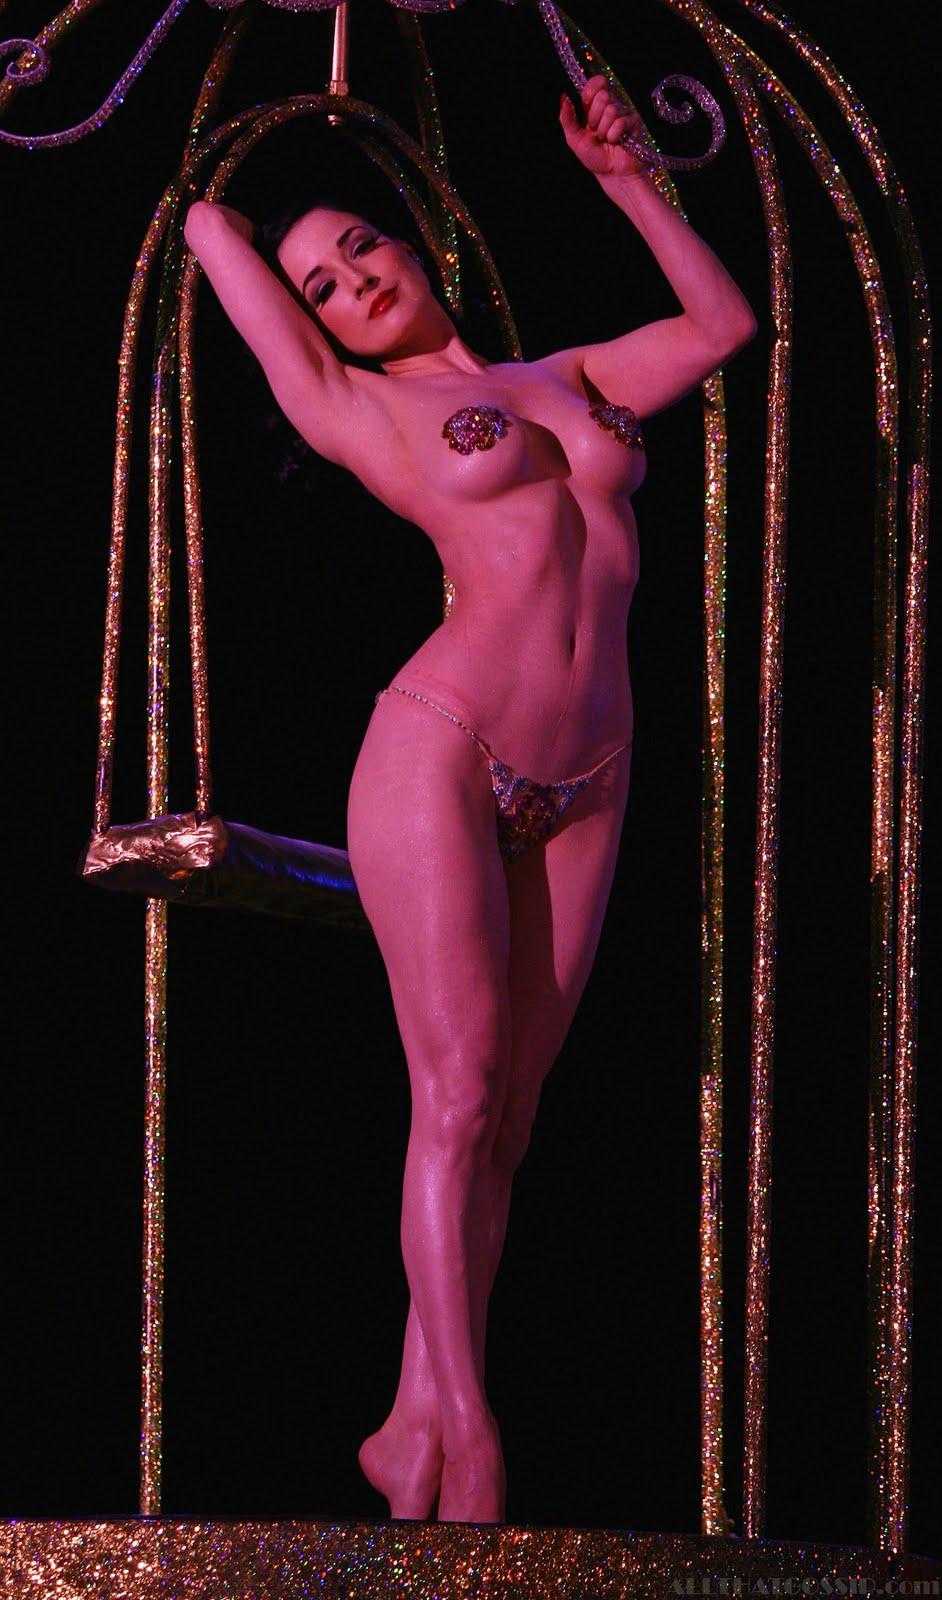 moroccan-woman-striptease-sexy-ebony-caught-masterbating